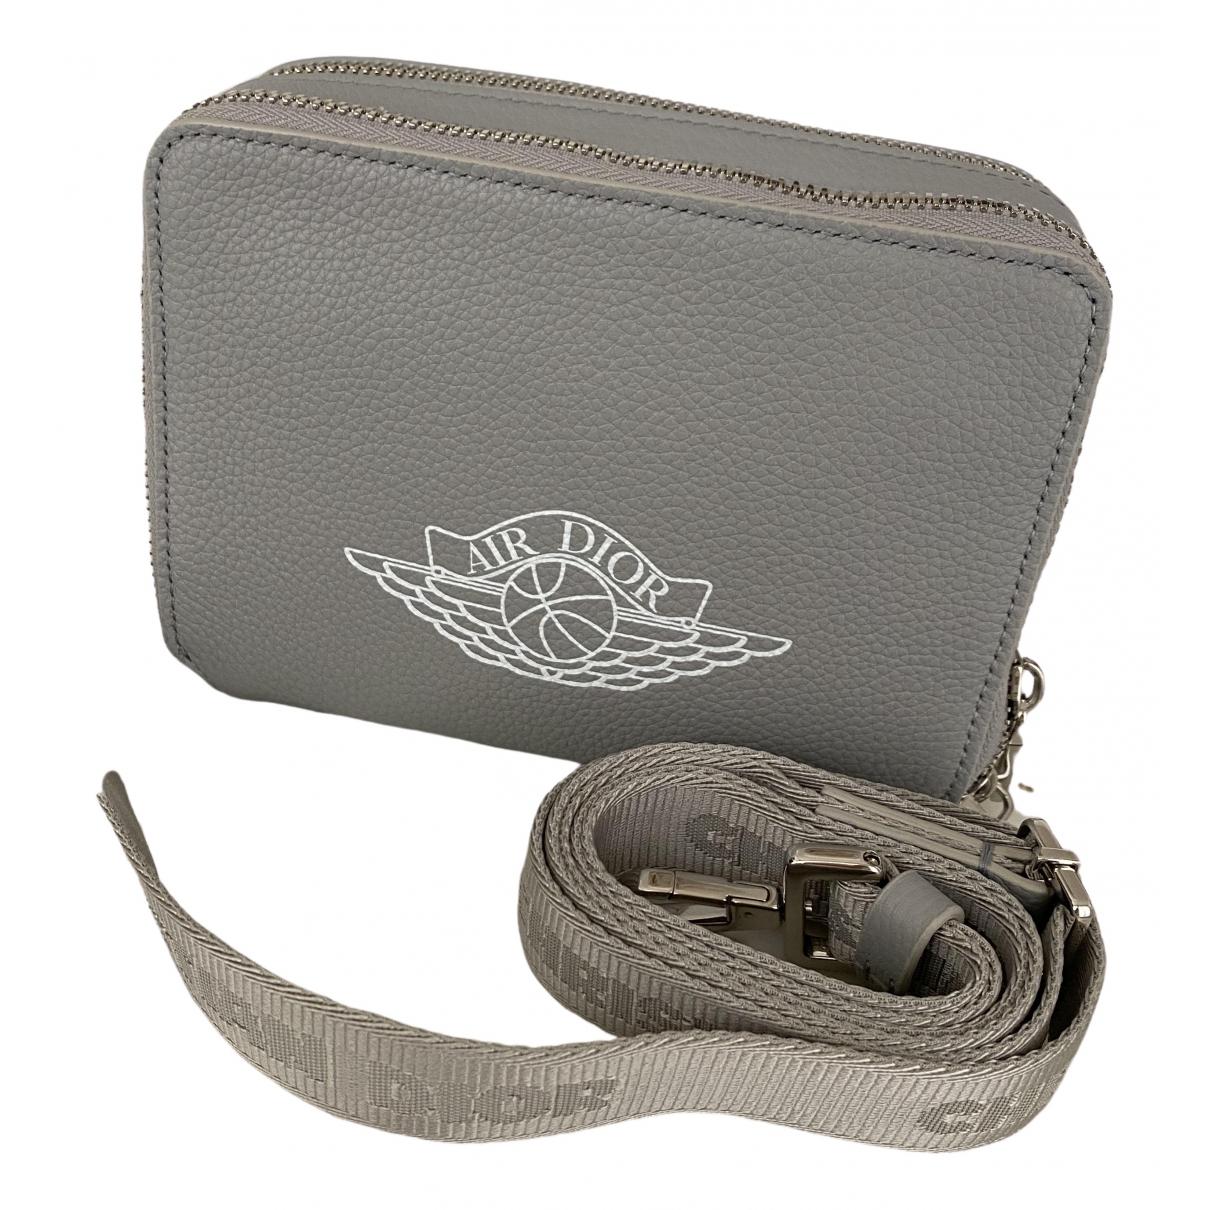 Jordan X Dior \N Grey Leather bag for Men \N